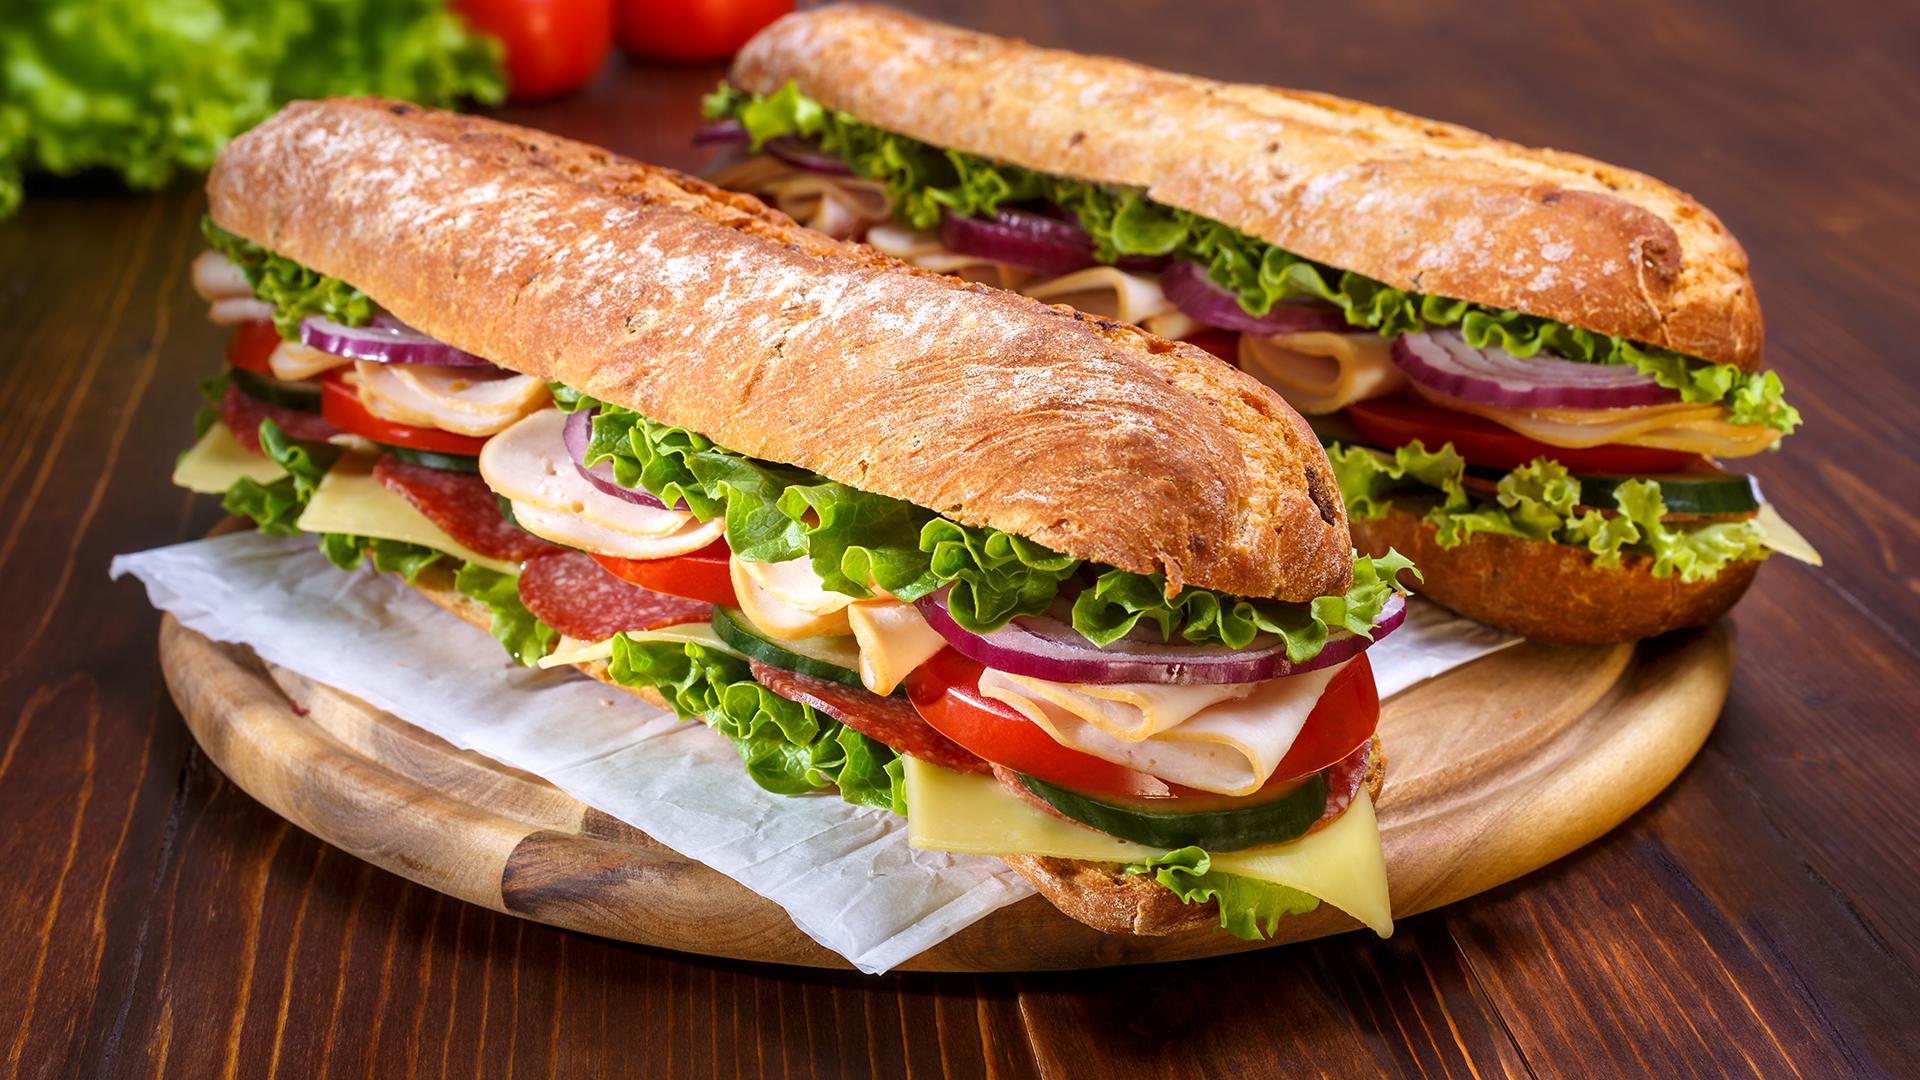 Sub or Sandwiches